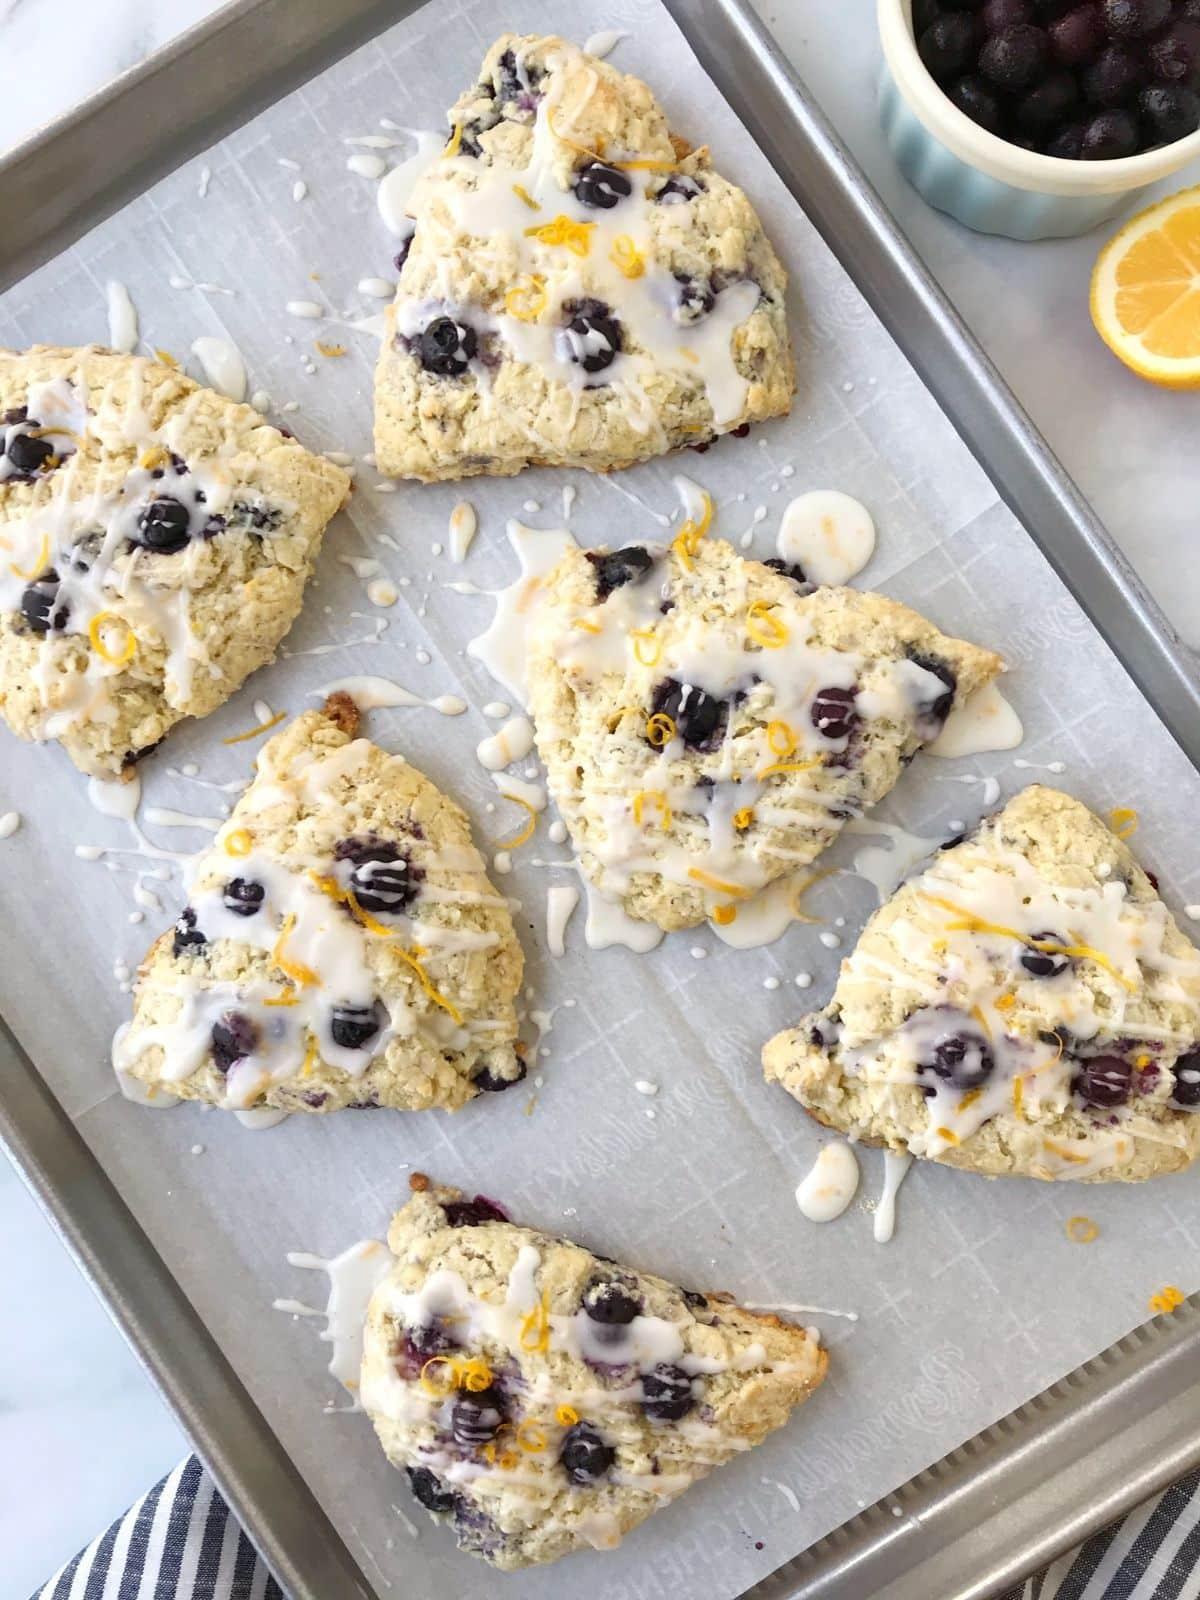 glazed scones on a sheet pan